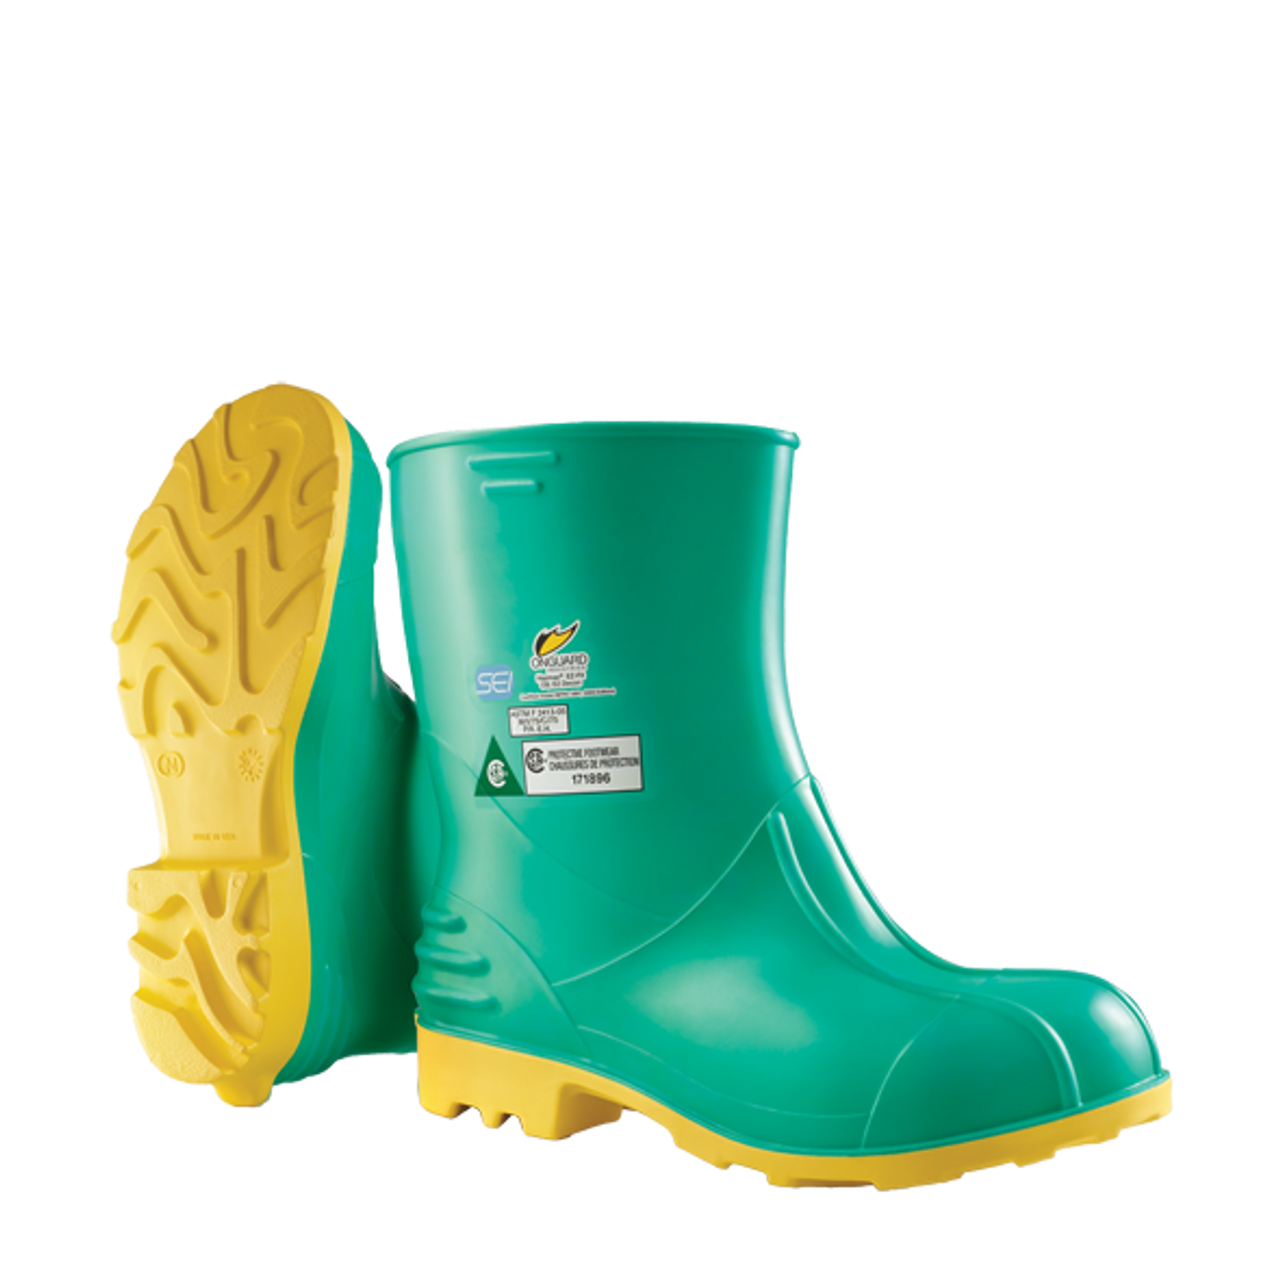 "ONGUARD Hazmax 87012 16/"" Steel Toe Hazmat Boots Size 11 lot of 3 pair"